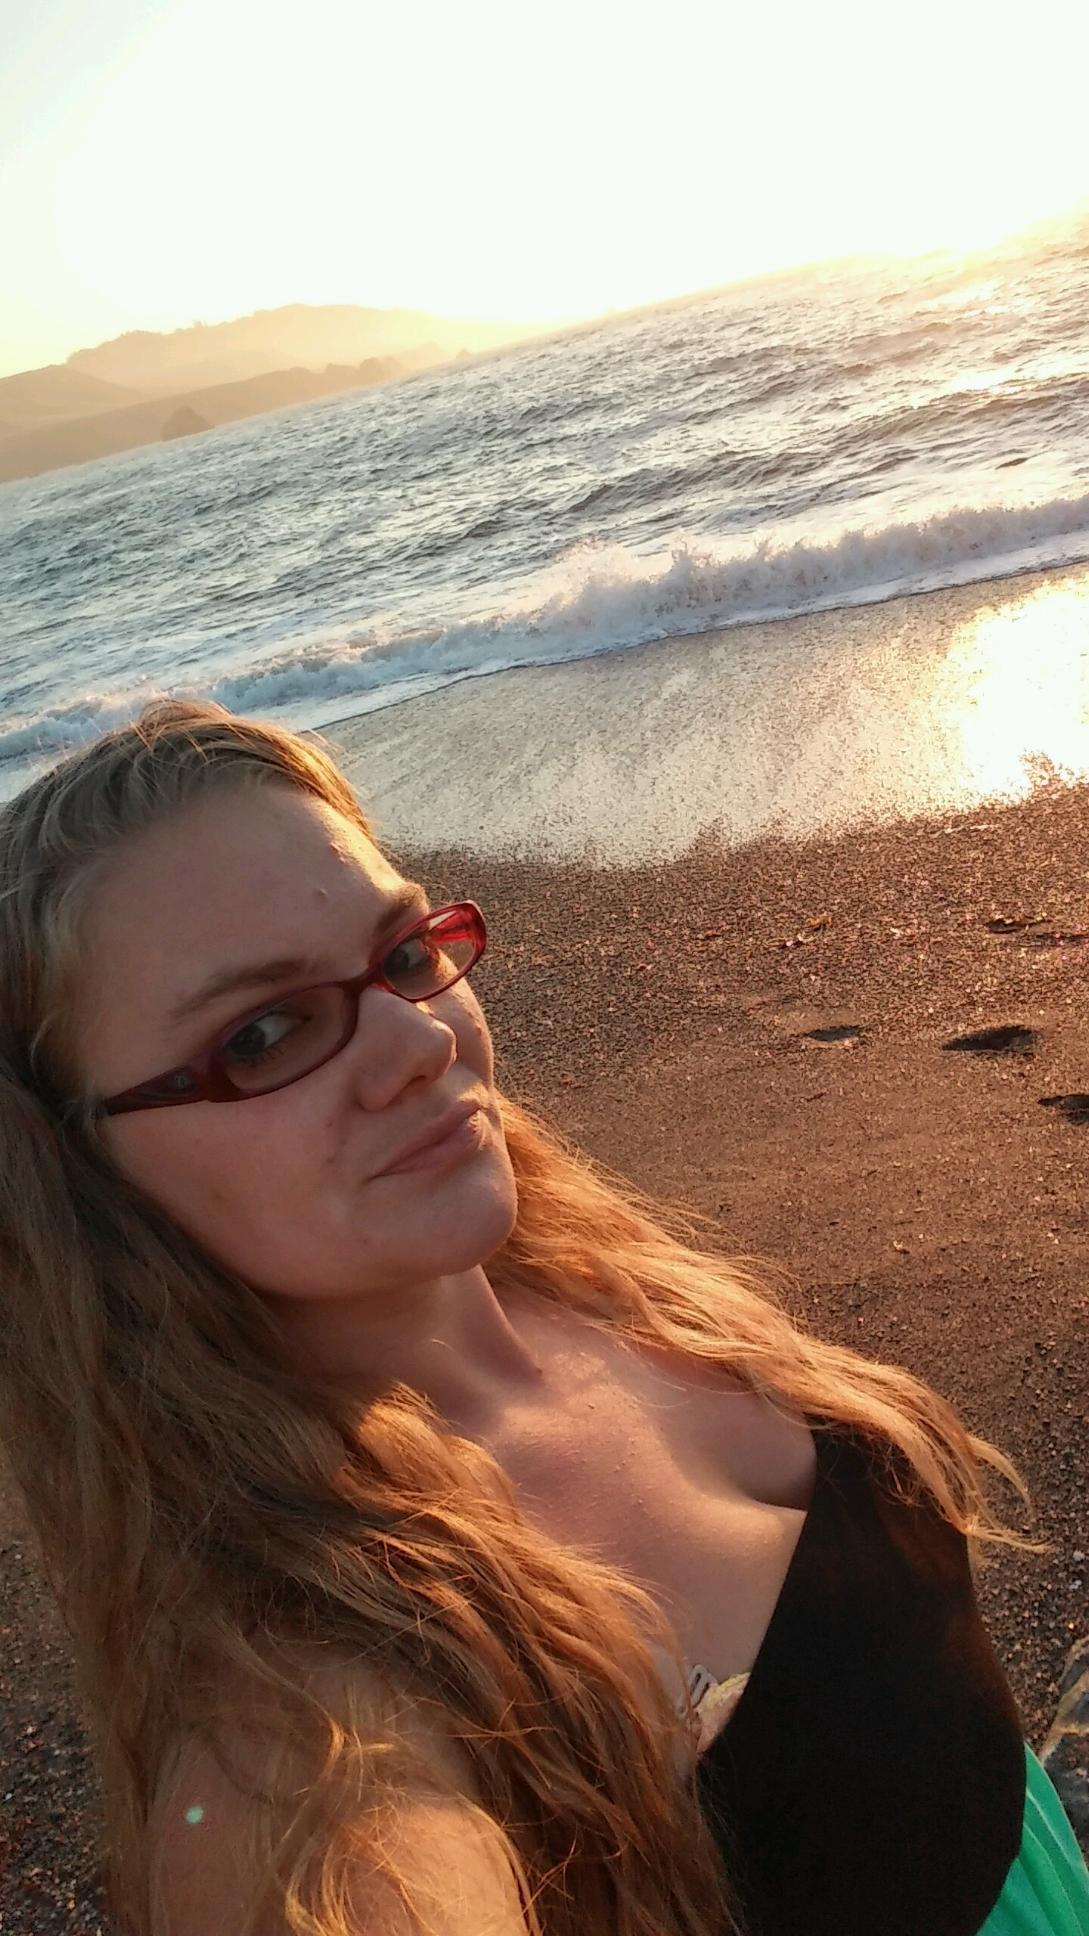 Woman for ExtraMarital profile evahotie